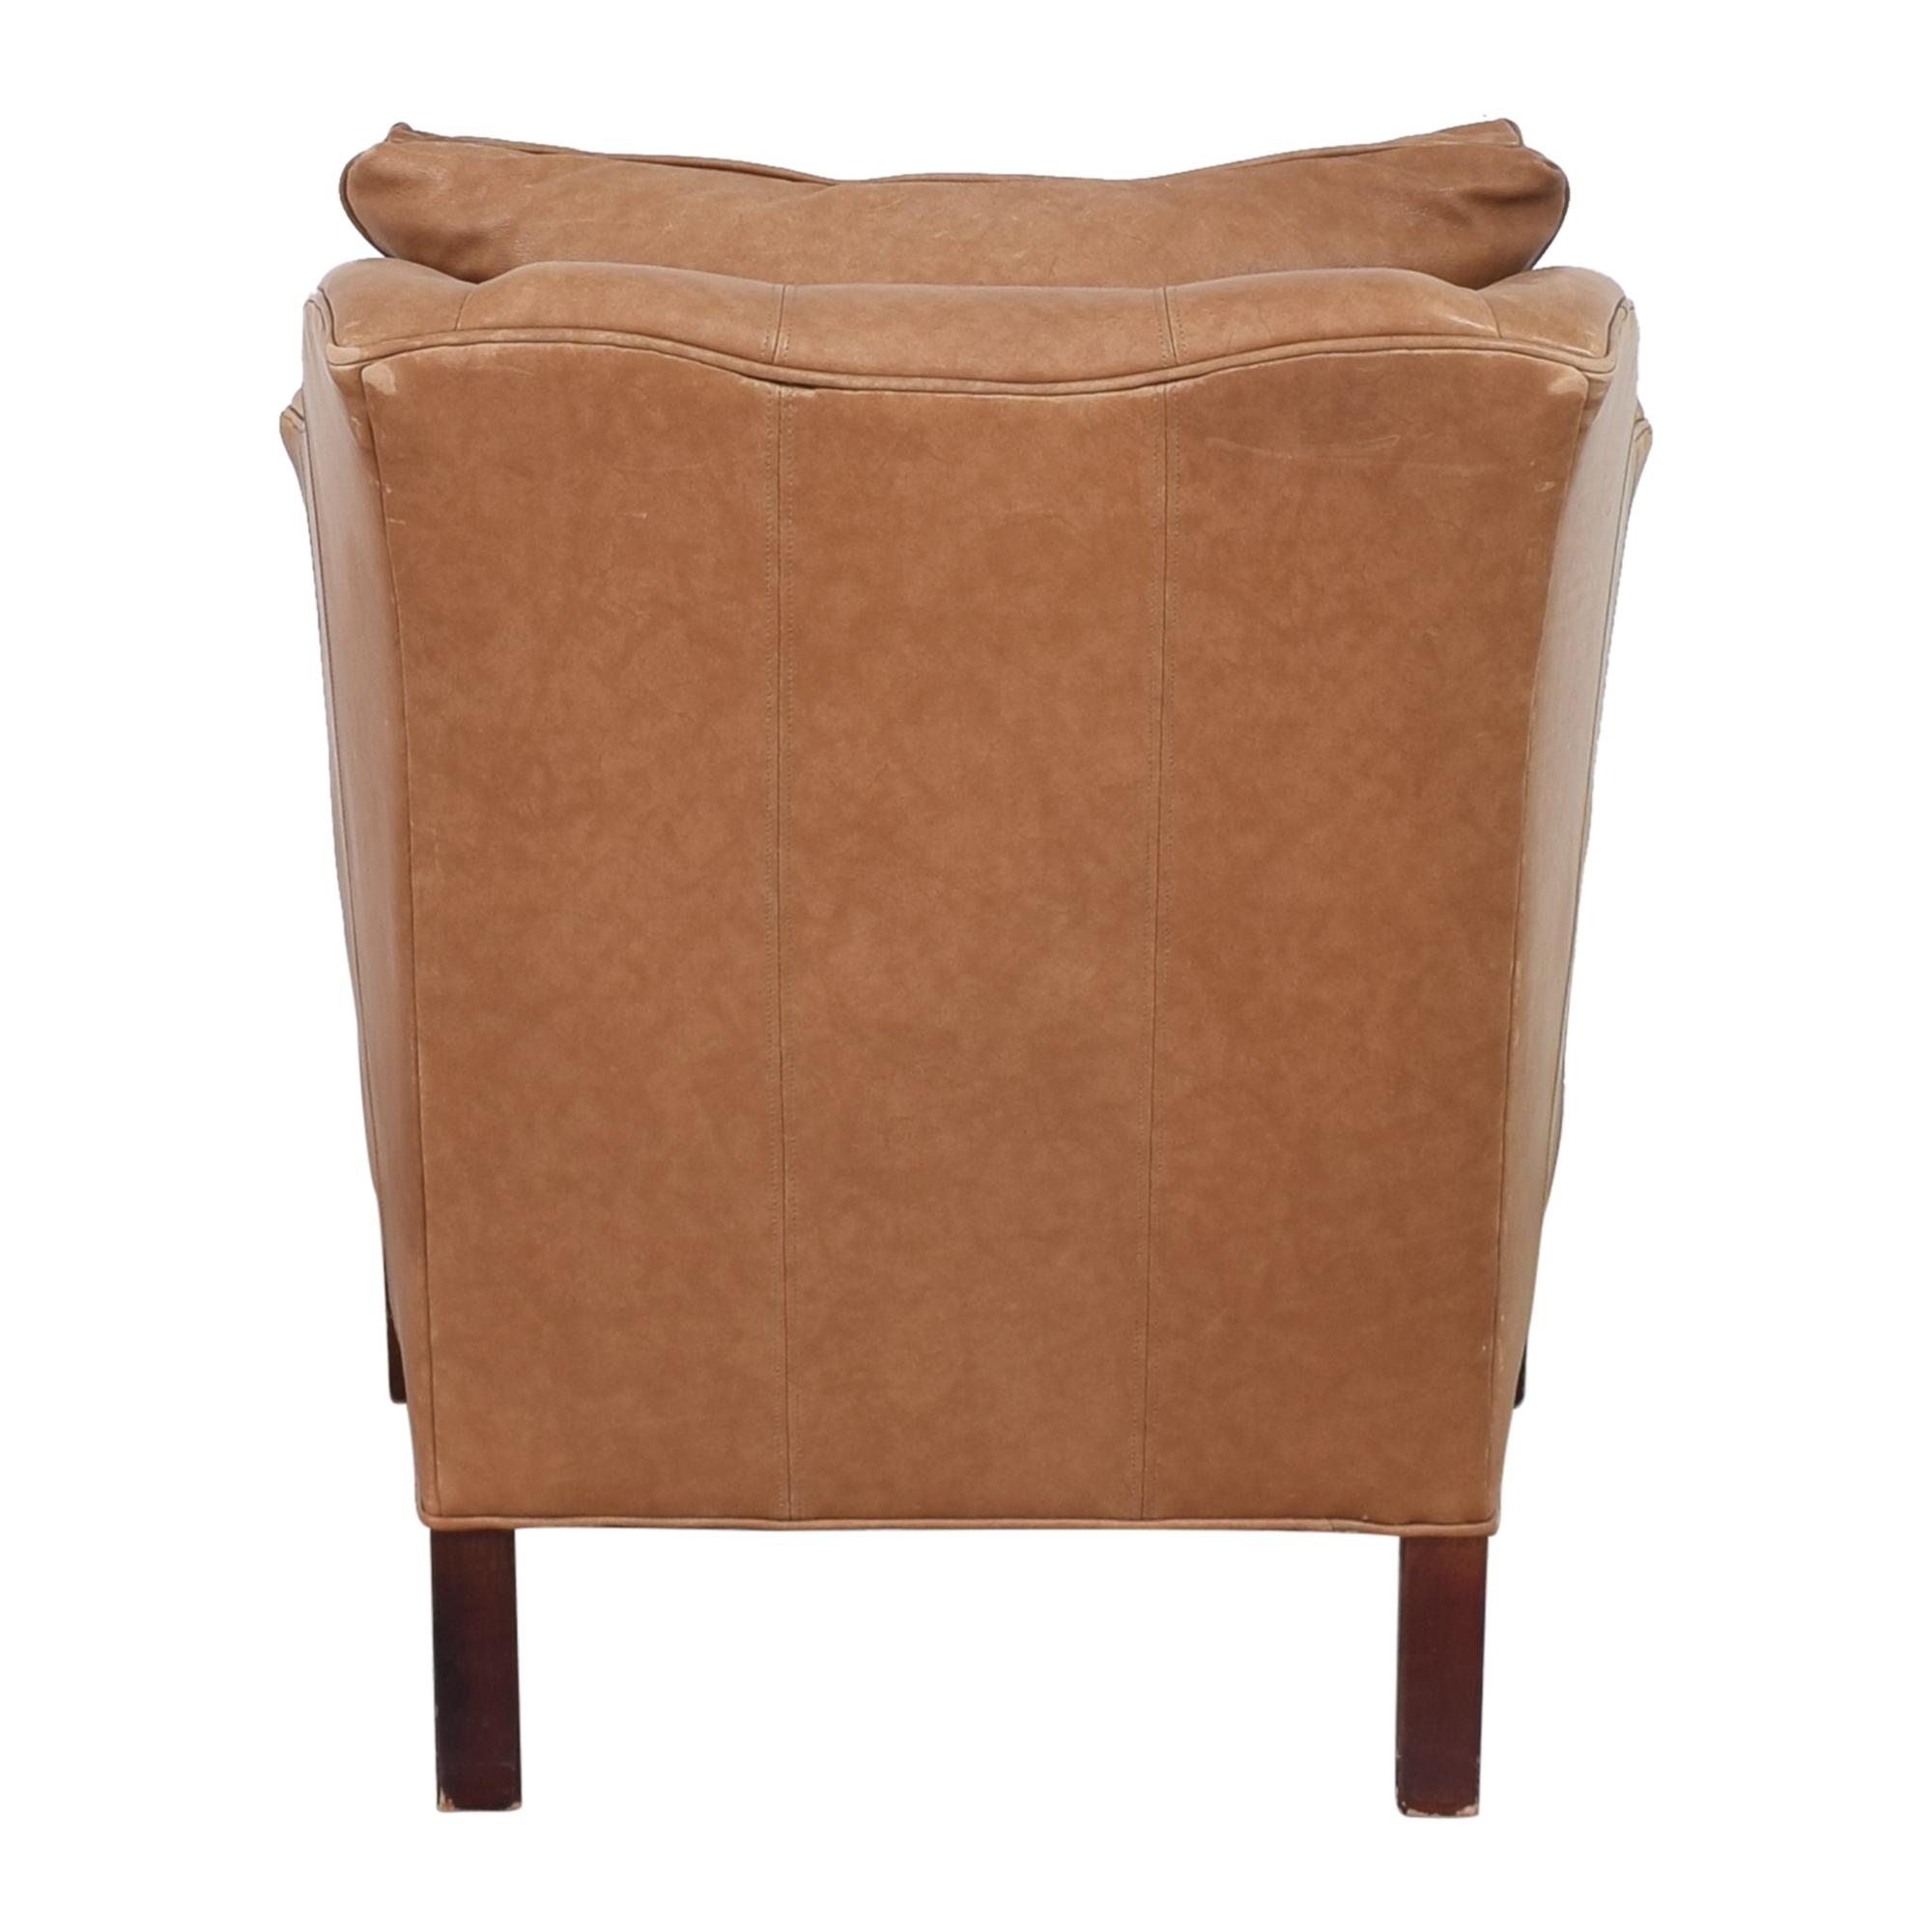 Ethan Allen Ethan Allen Flare Arm Accent Chair nj